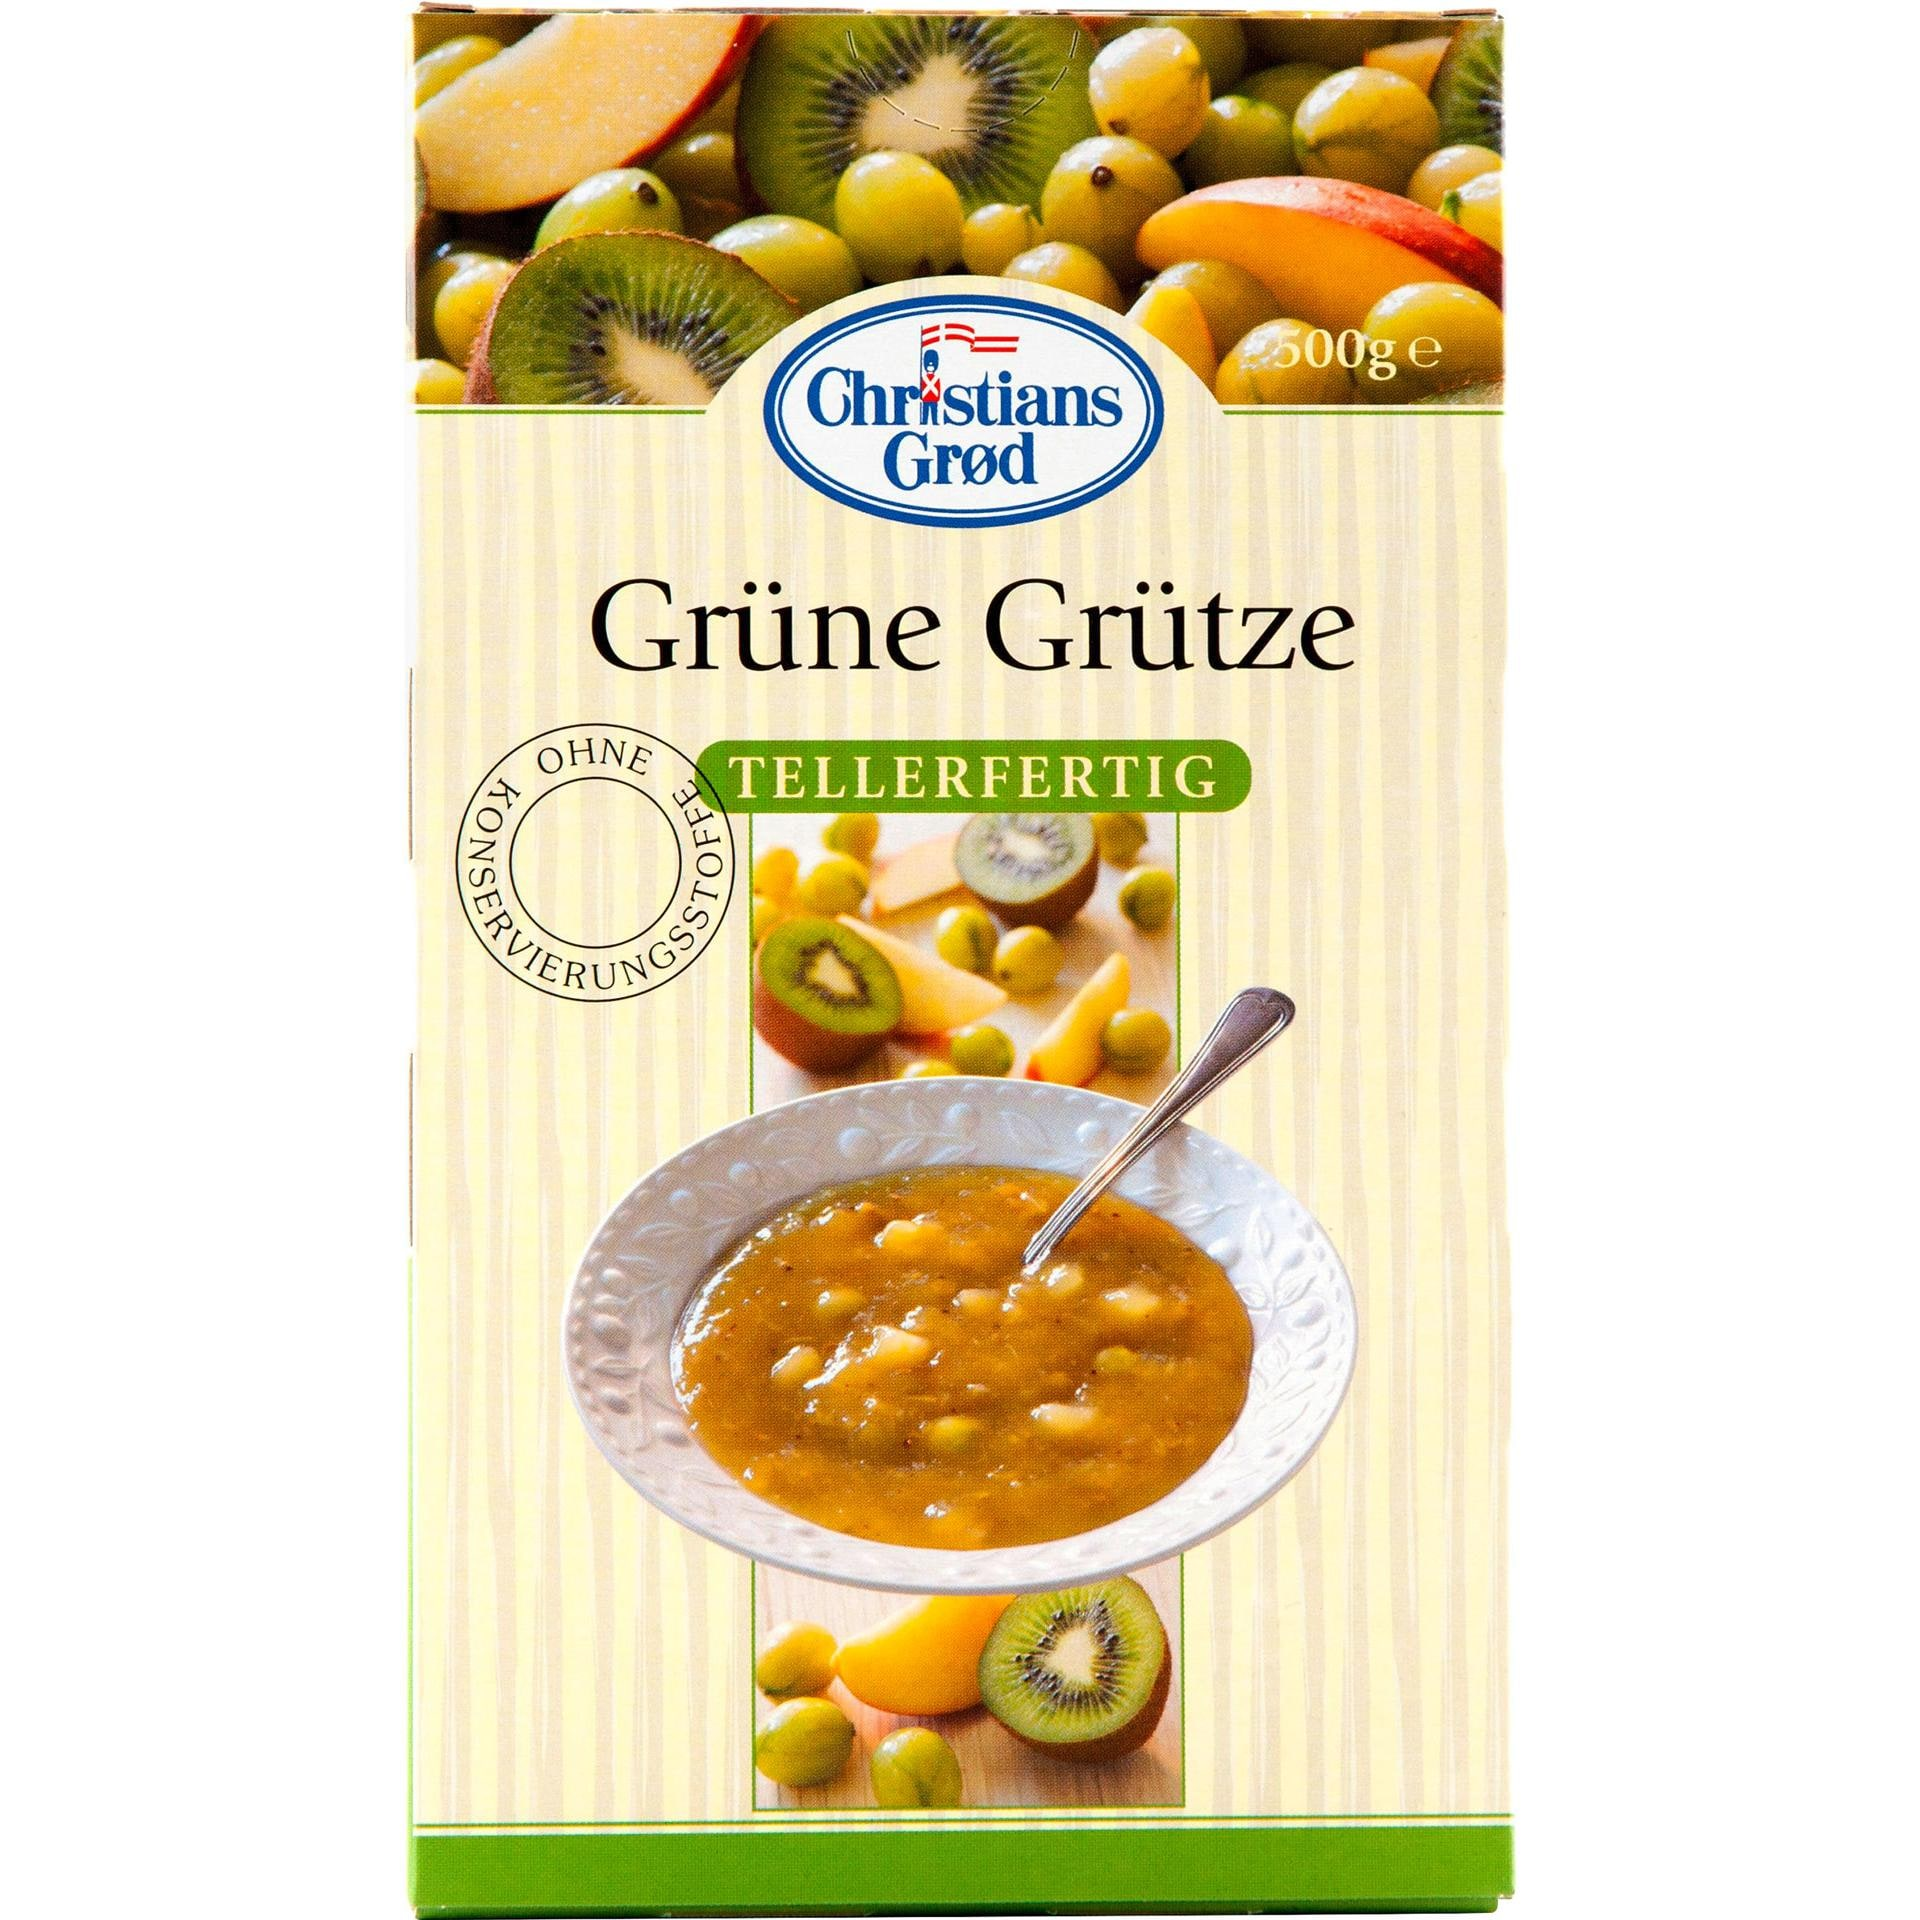 Christians Grod - Grüne Grütze - 500g